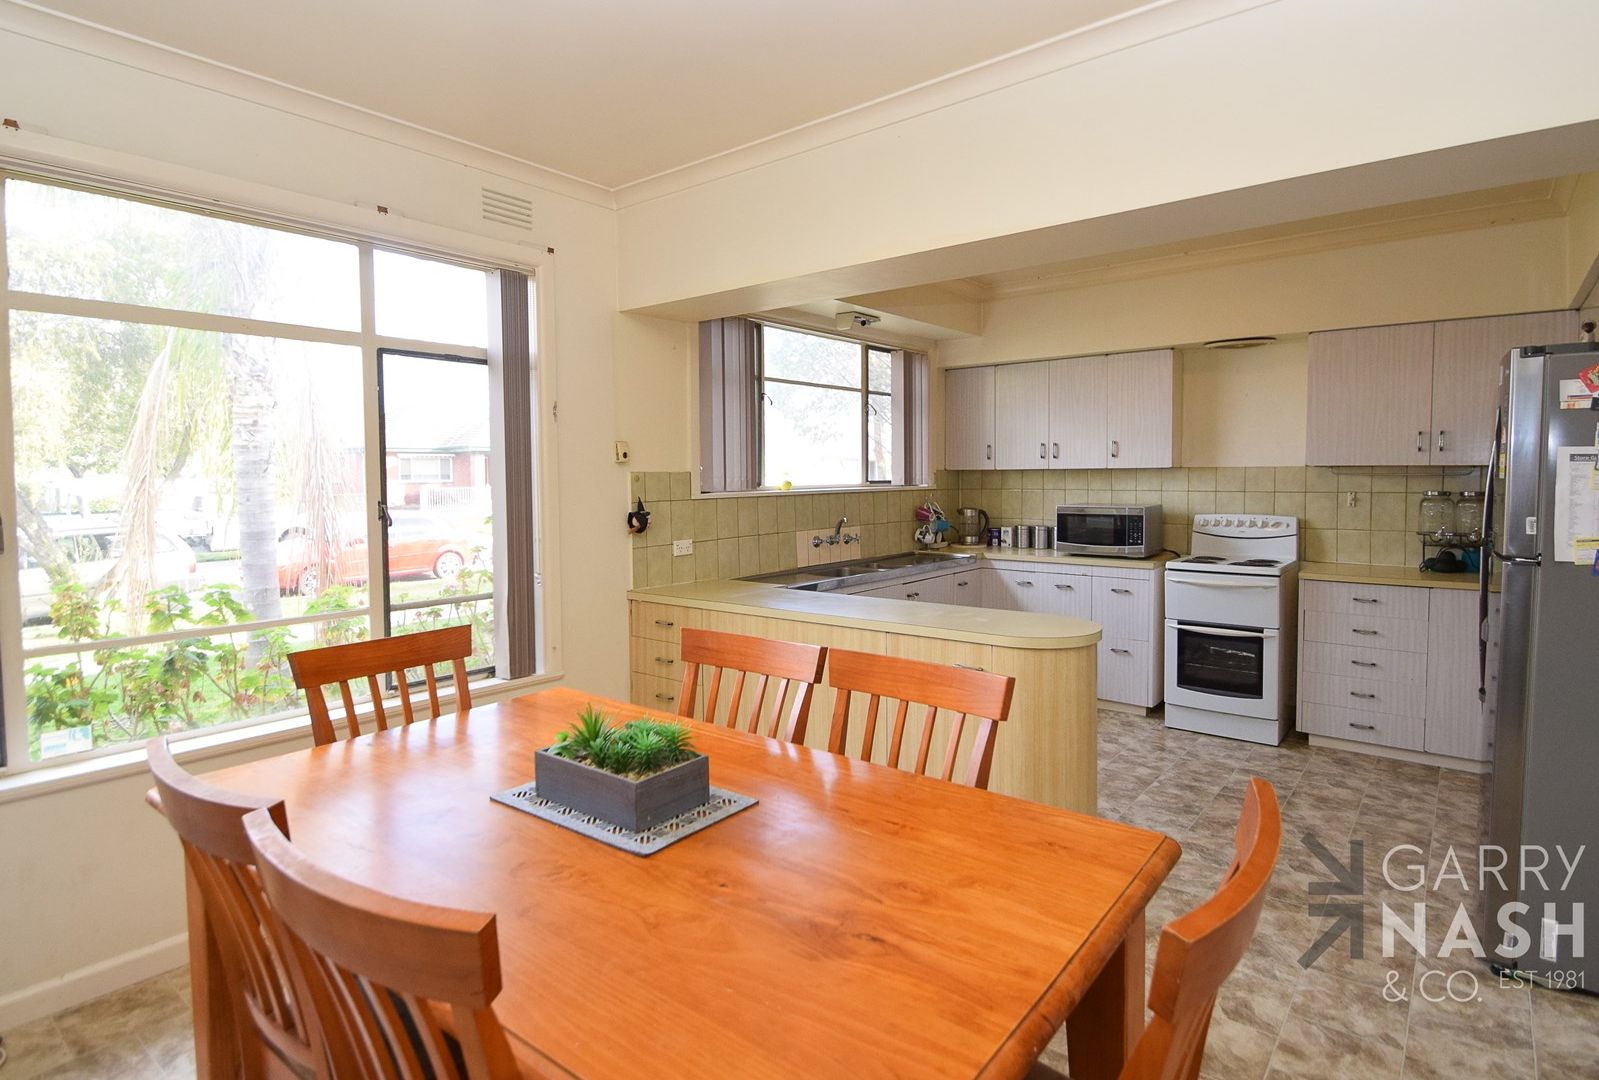 10 Taylor Street, Wangaratta VIC 3677, Image 1